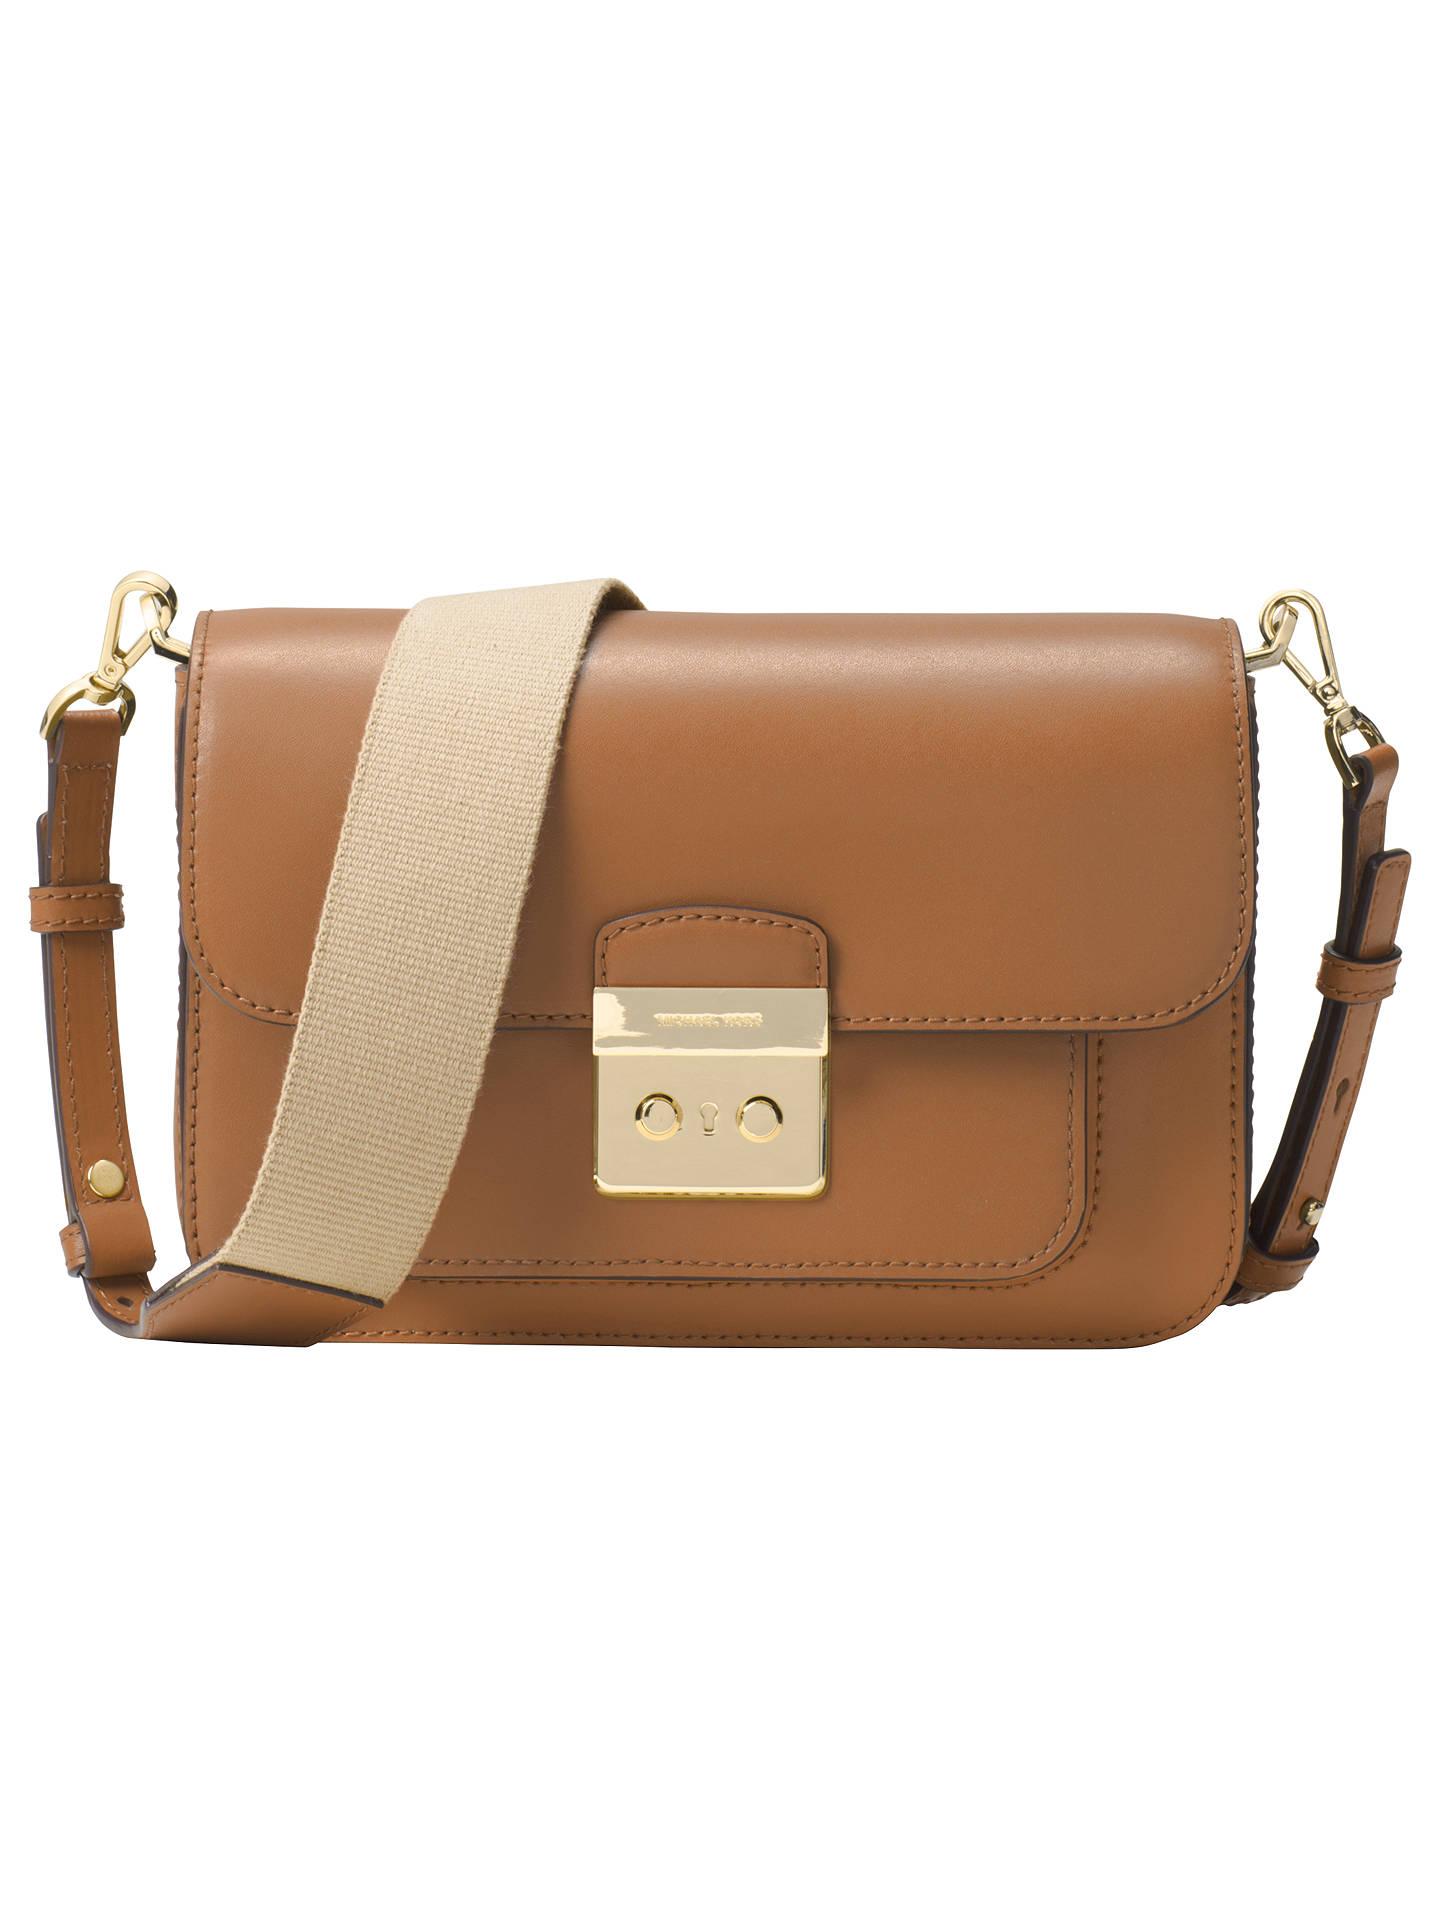 04806895600f97 Buy MICHAEL Michael Kors Sloan Editor Medium Leather Shoulder Bag, Acorn  Online at johnlewis.